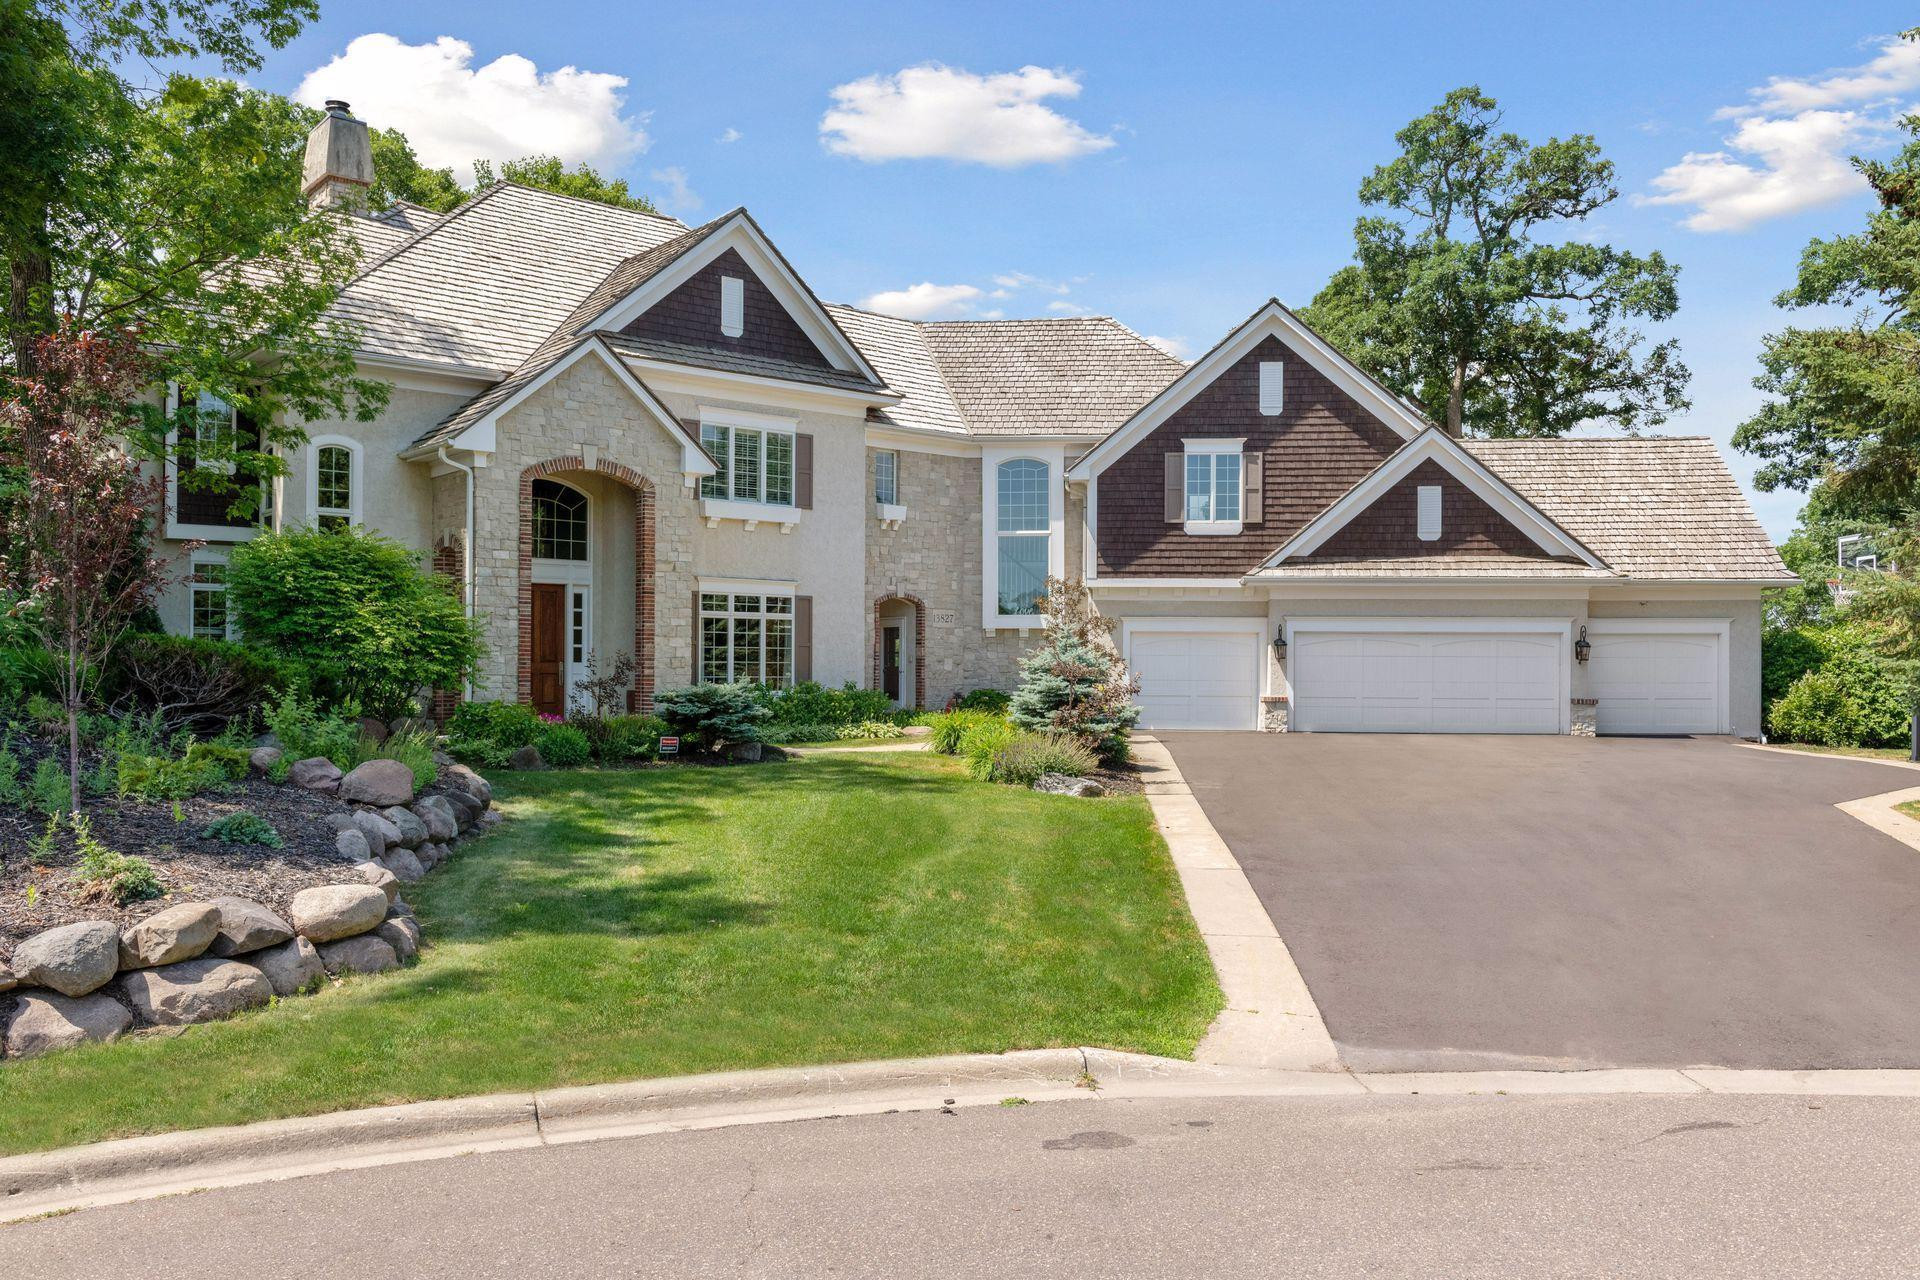 13827 Wood Lane, Minnetonka, MN 55305